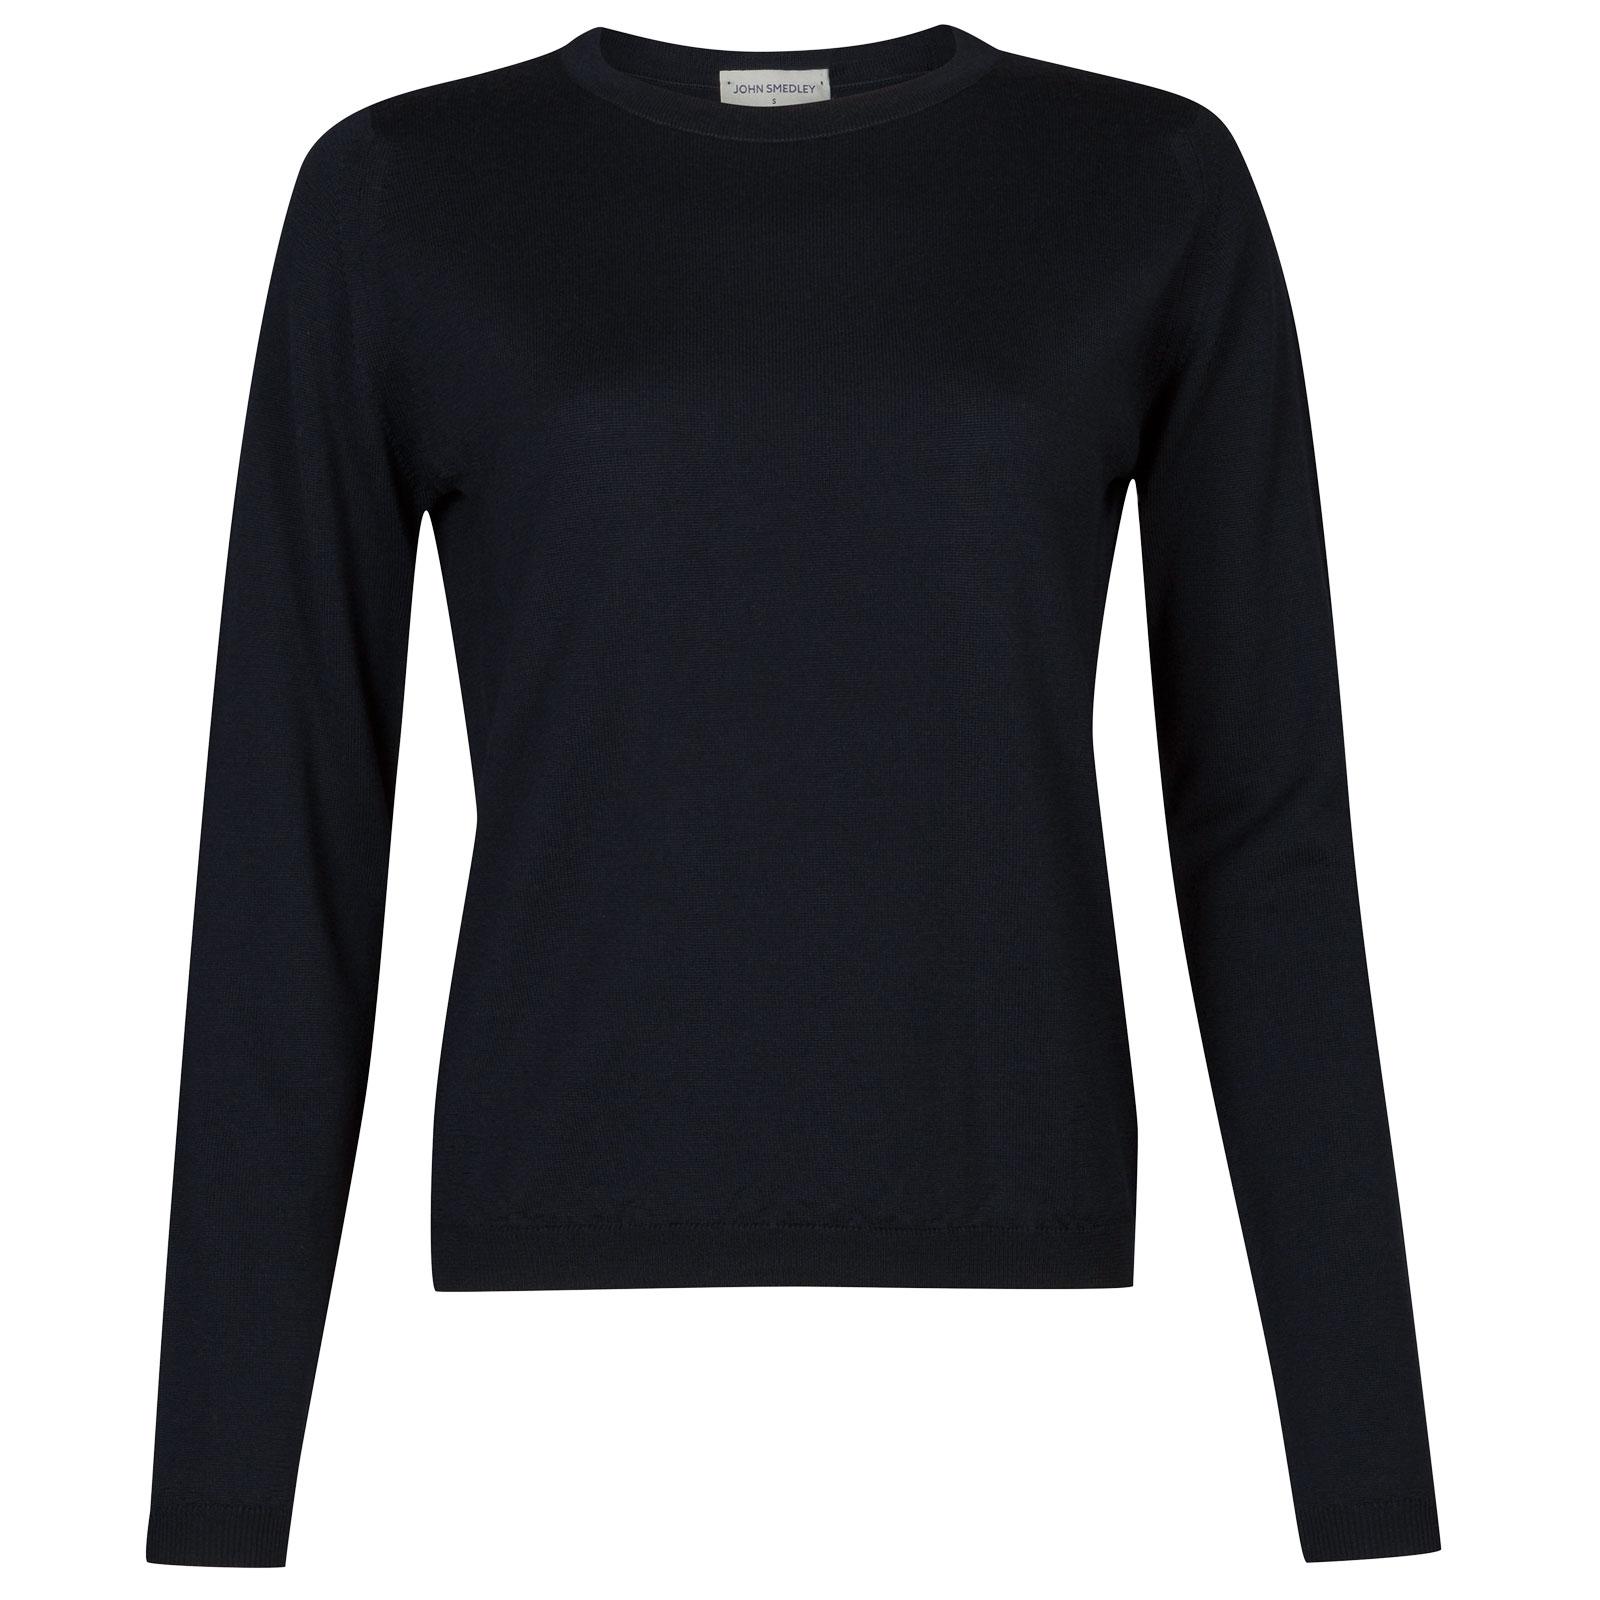 John Smedley Edmee Merino Wool Sweater in Midnight-L